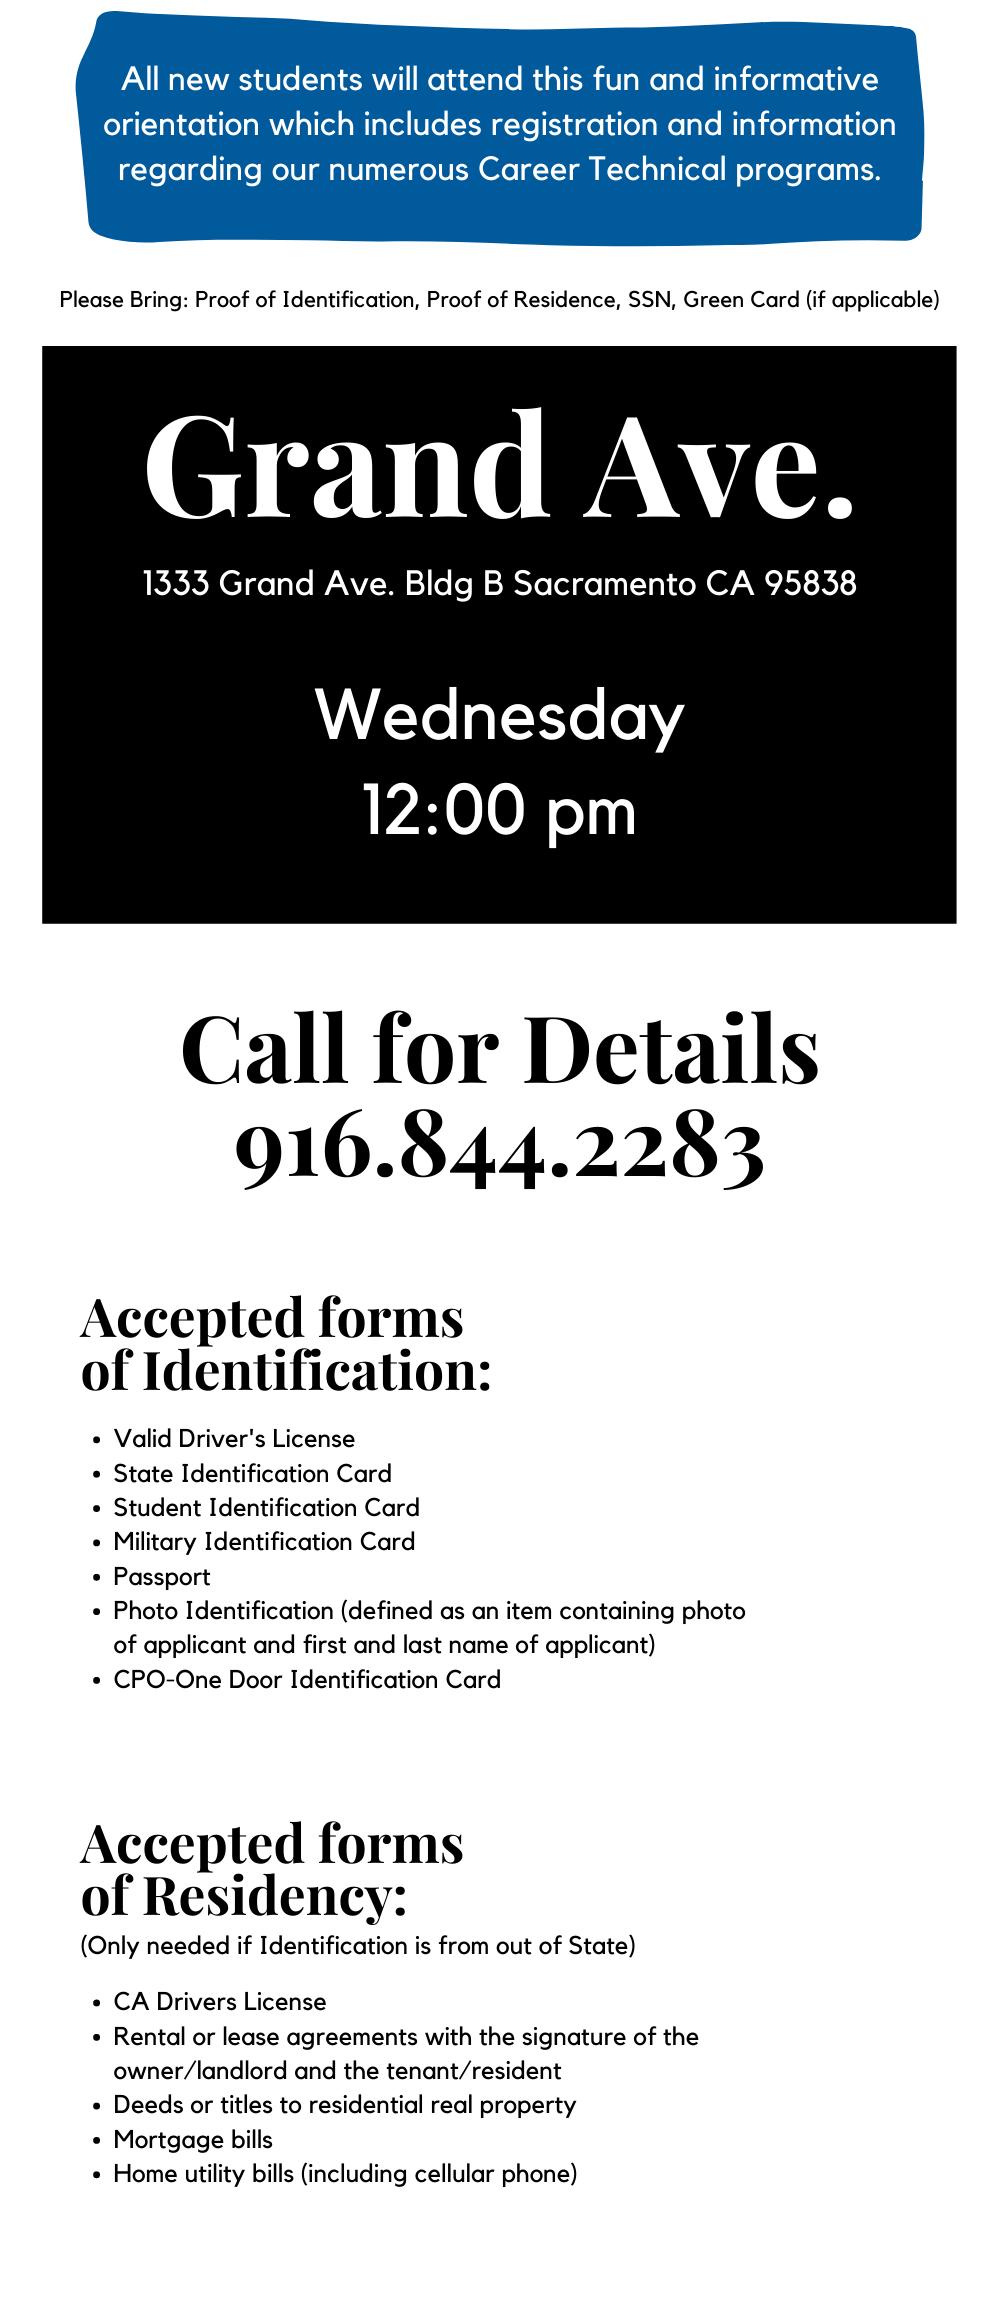 Orientation details